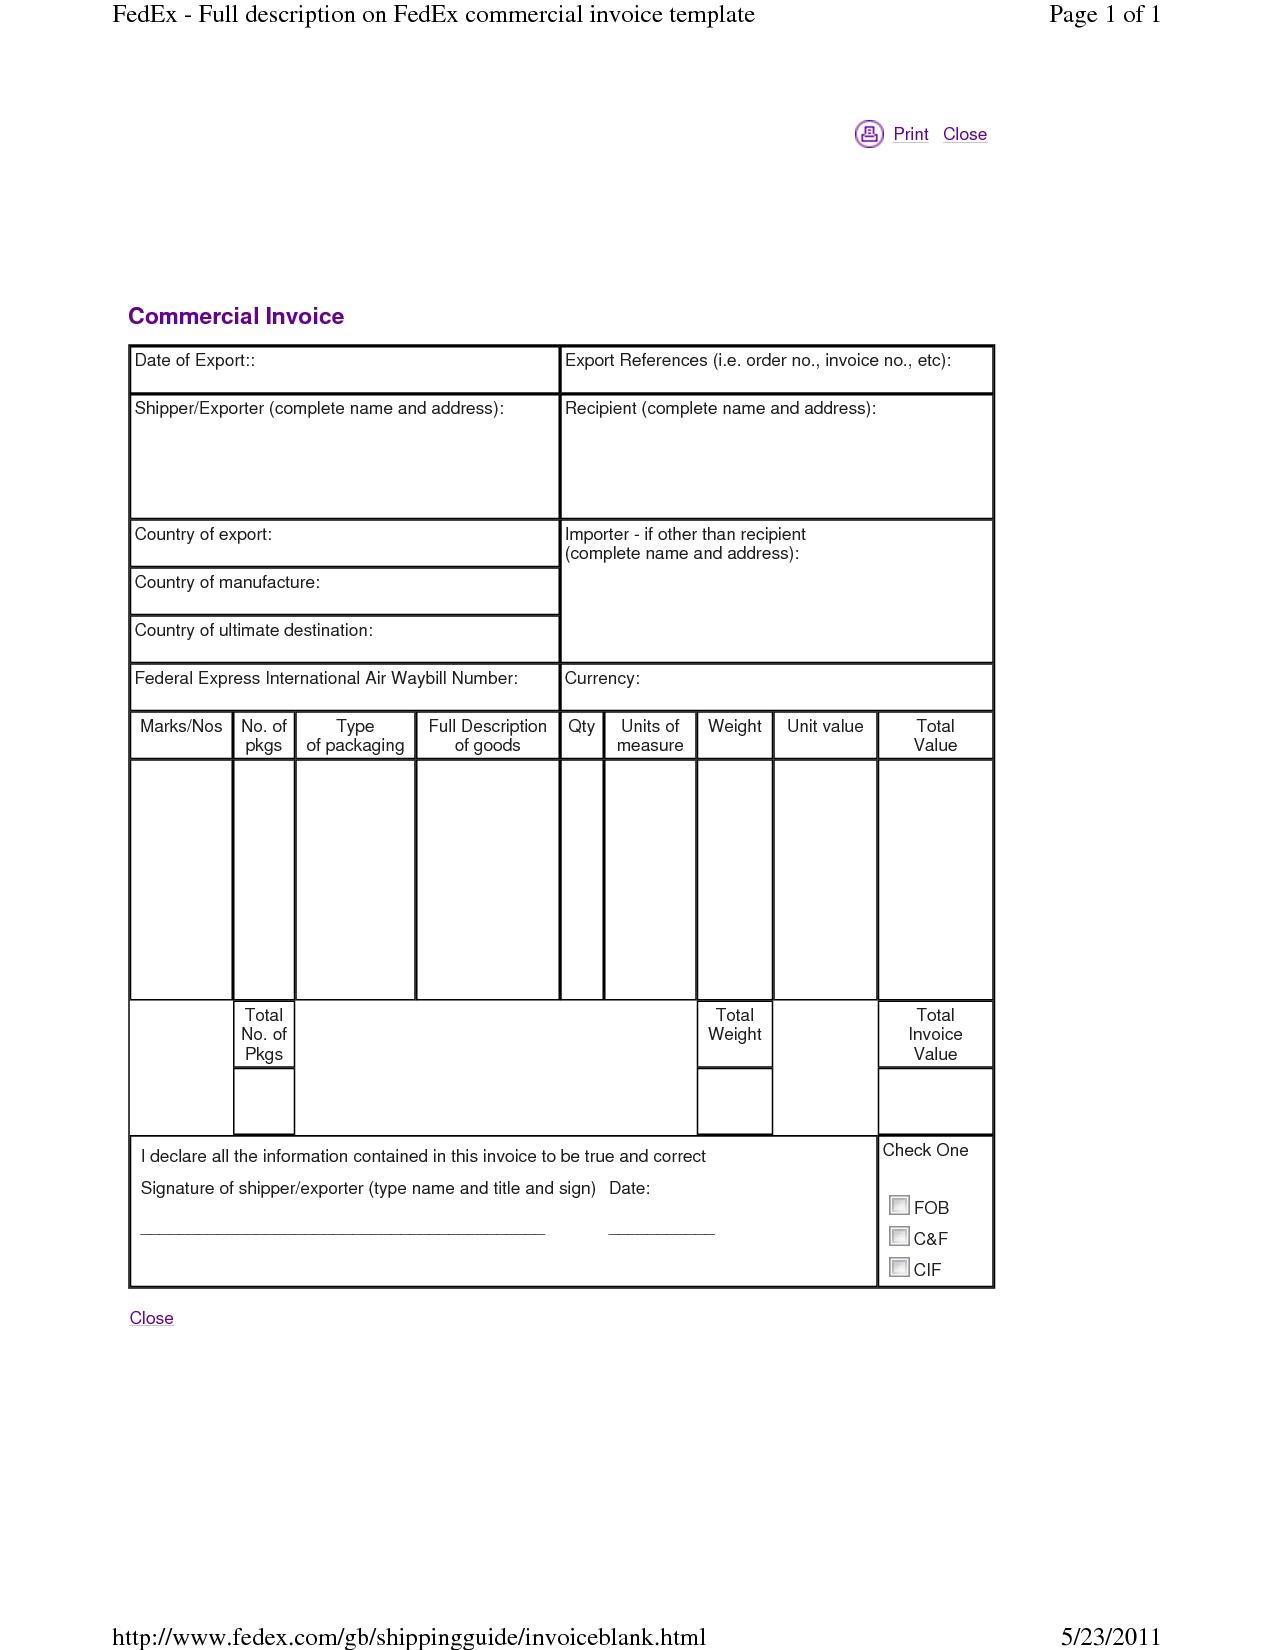 fedex comercial invoice invoice template ideas. Black Bedroom Furniture Sets. Home Design Ideas